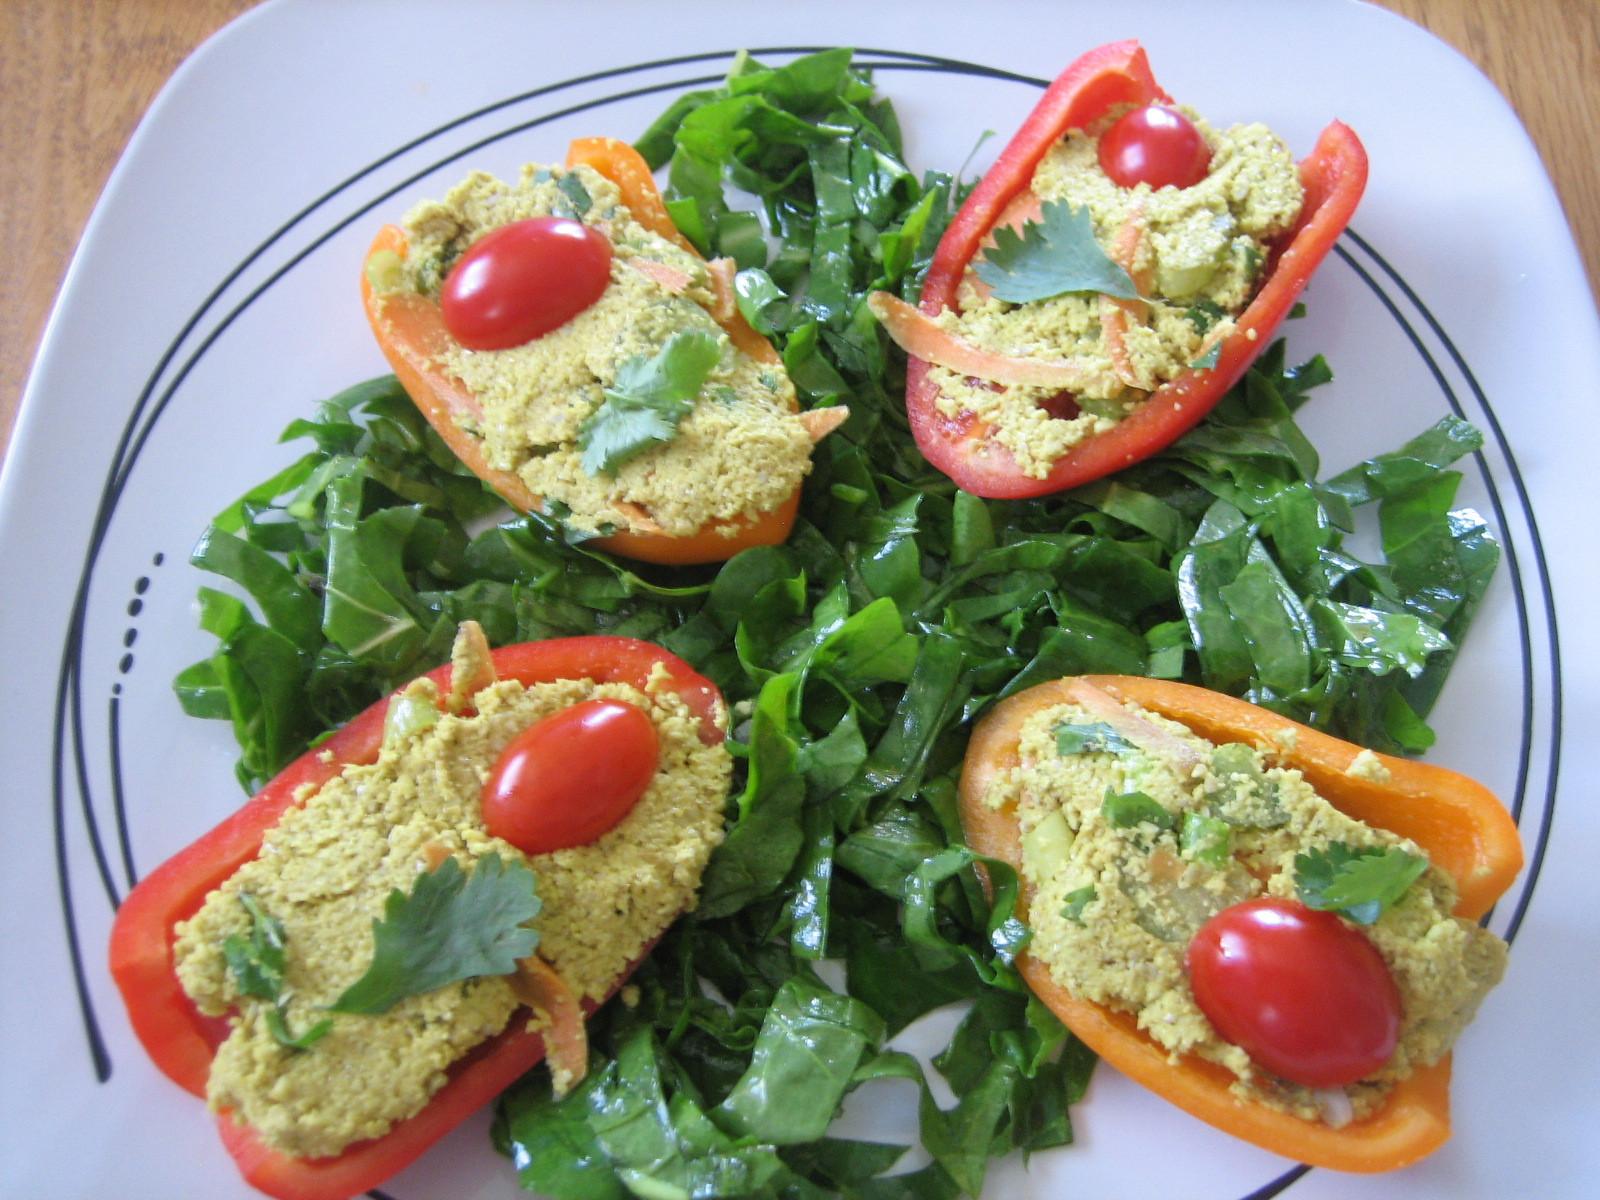 Raw Vegan Lunch Recipes  Raw & vegan lunch buffet this Sunday January 16th